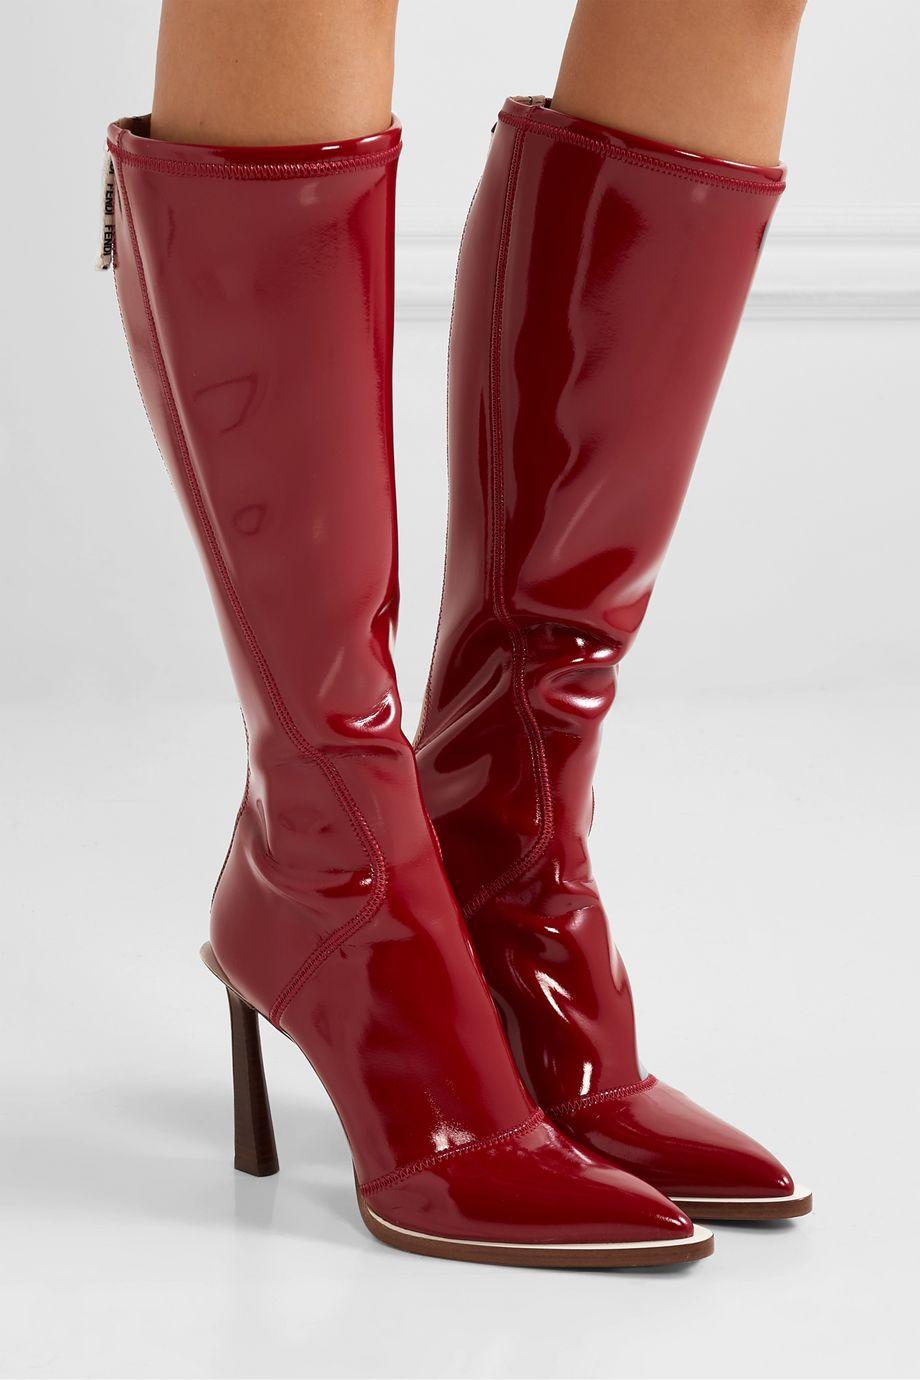 Fendi Glossed-neoprene knee boots